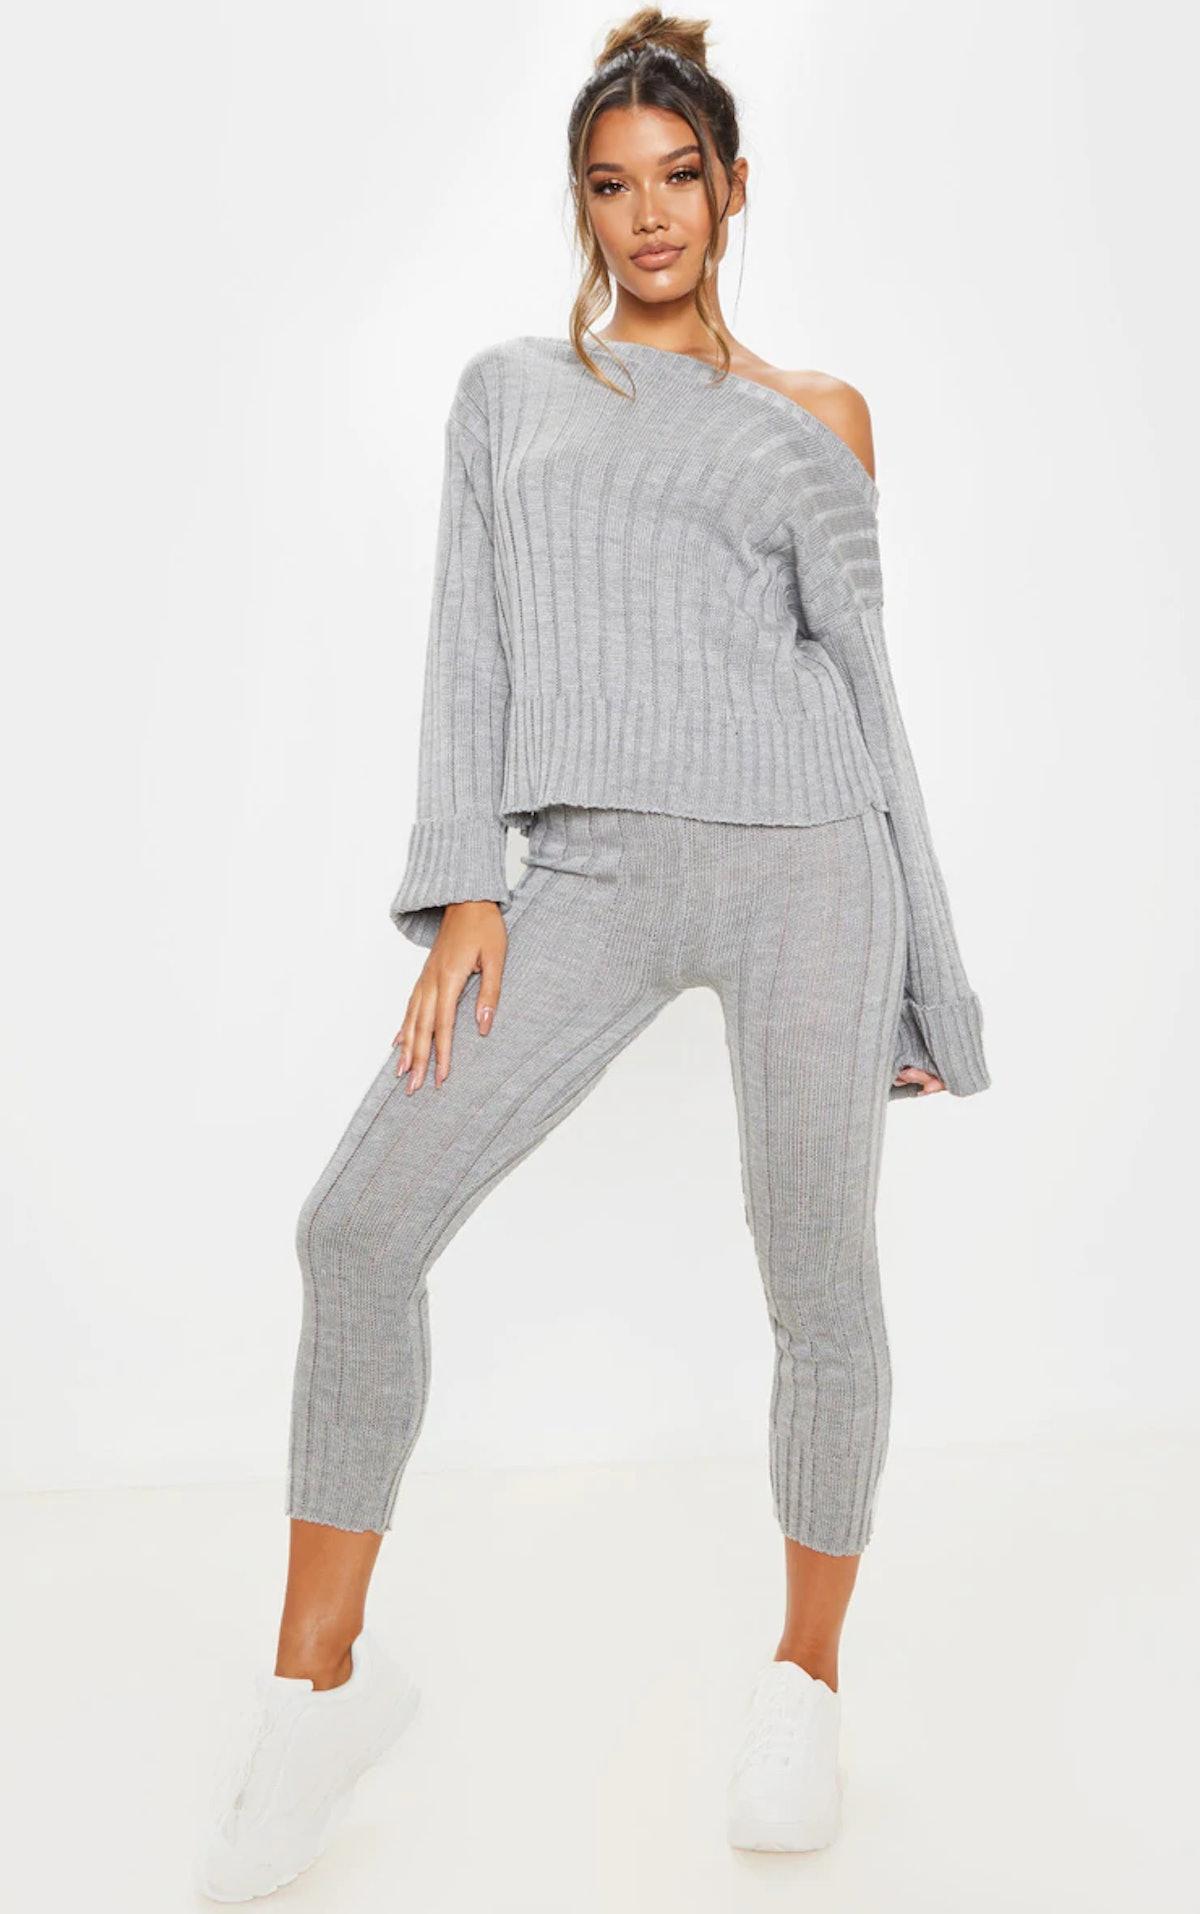 PrettyLittleThing Grey Bardot Jumper And Legging Lounge Set